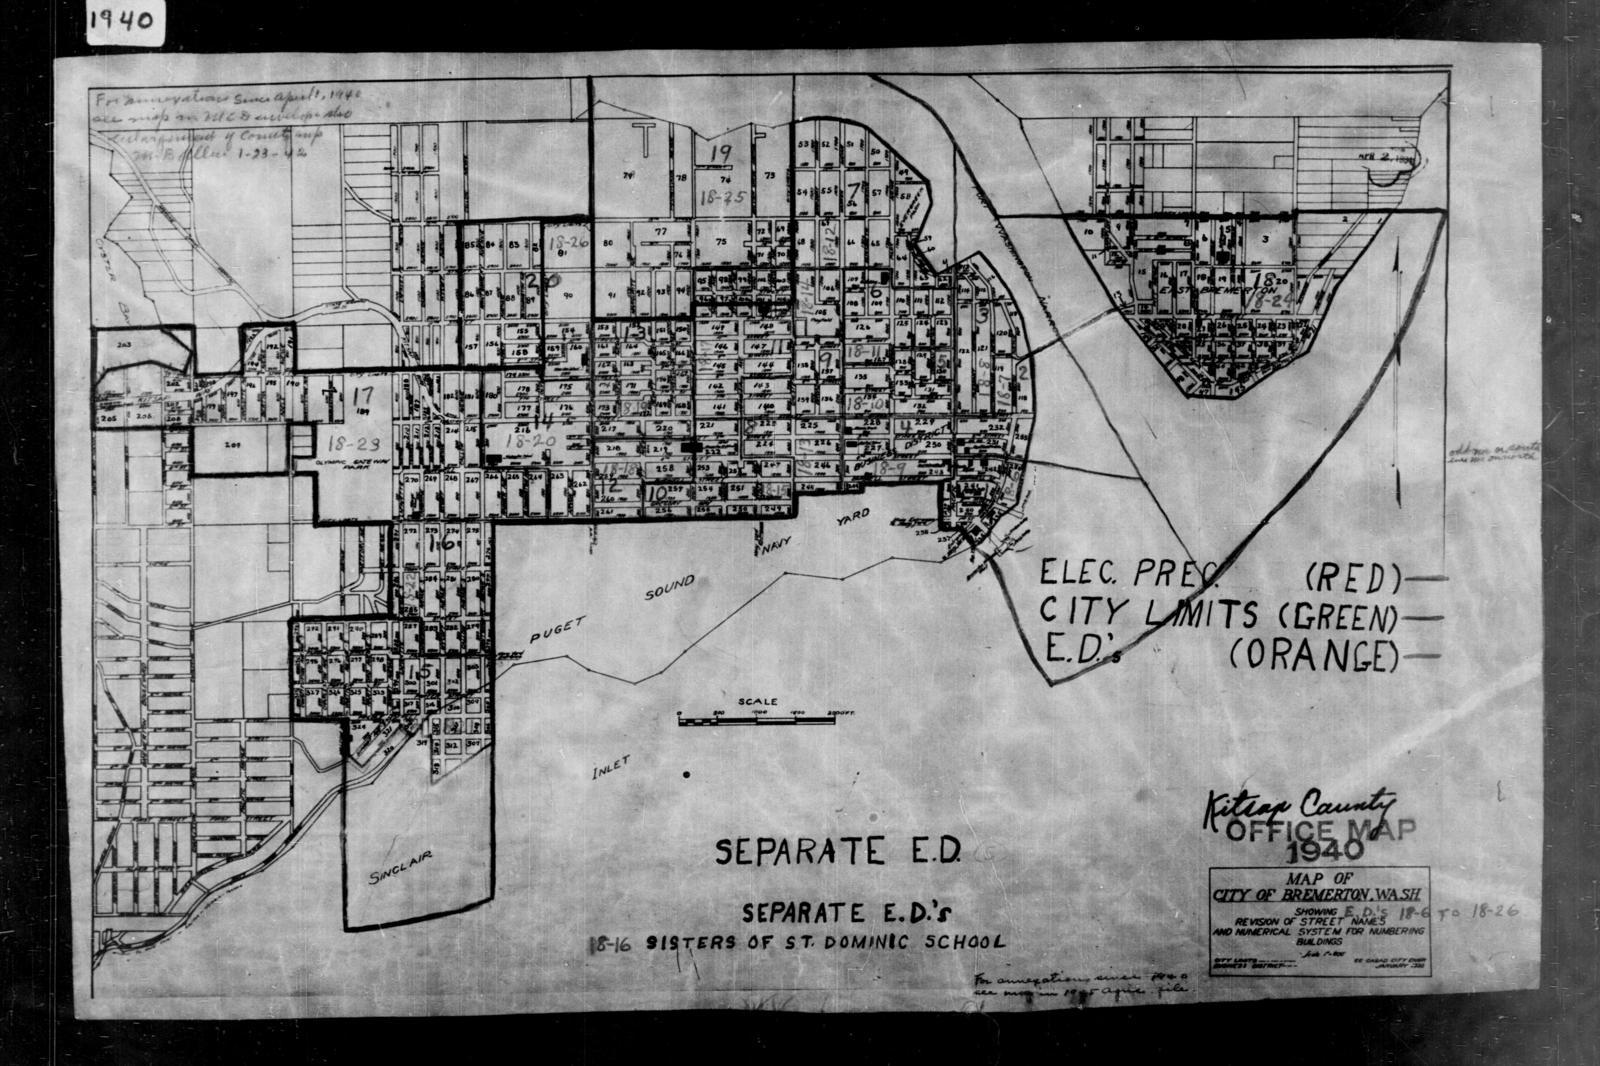 1940 Census Enumeration District Maps - Washington - Kitsap ... on map of athens al city limits, map of bellevue ne city limits, map of bozeman mt city limits, map of clarksville tn city limits, map of charleston sc city limits, map of beckley wv city limits, map of alpharetta ga city limits, map of billings mt city limits, map of auburn al city limits, map of covington la city limits, map of columbus ms city limits, map of columbia mo city limits, map of charlotte nc city limits, map of bloomington il city limits, map of charleston wv city limits, map of bowling green ky city limits, map of cookeville tn city limits, map of alexandria va city limits, map of abilene tx city limits, map of amarillo tx city limits,